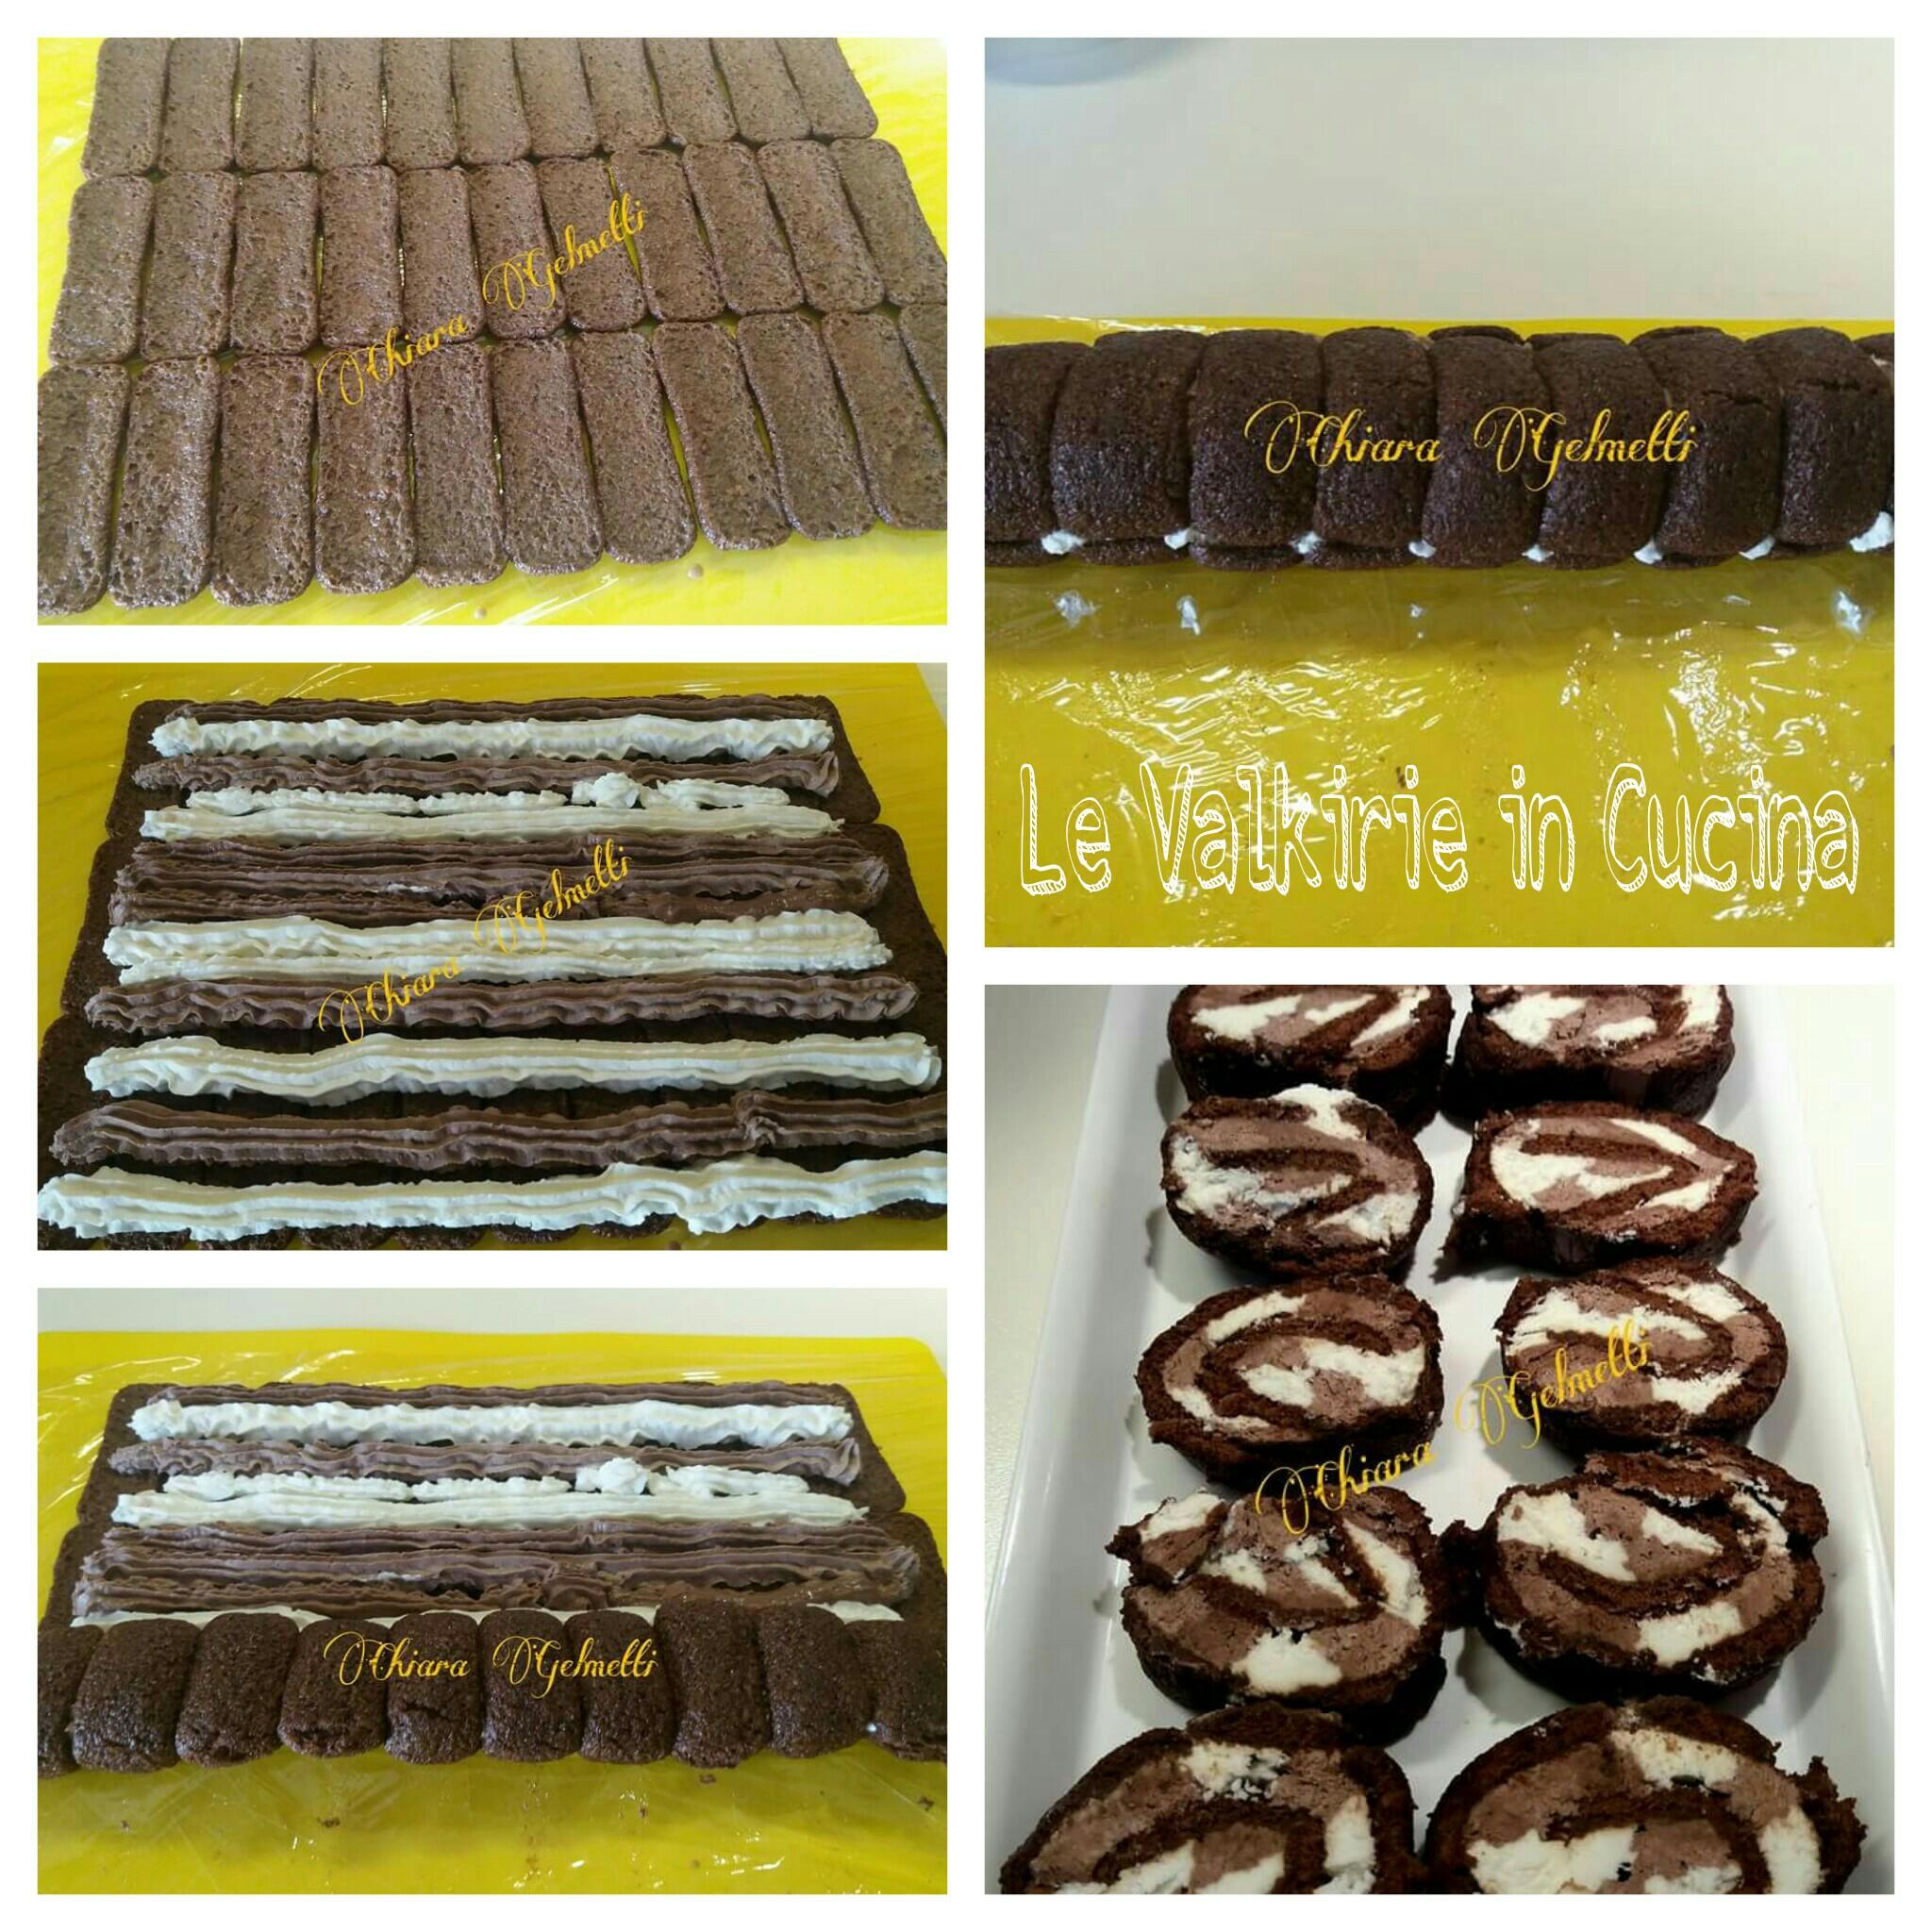 Rotolo di pavesini con panna mascarpone e cacao di chiara - Differenza panna da cucina e panna fresca ...